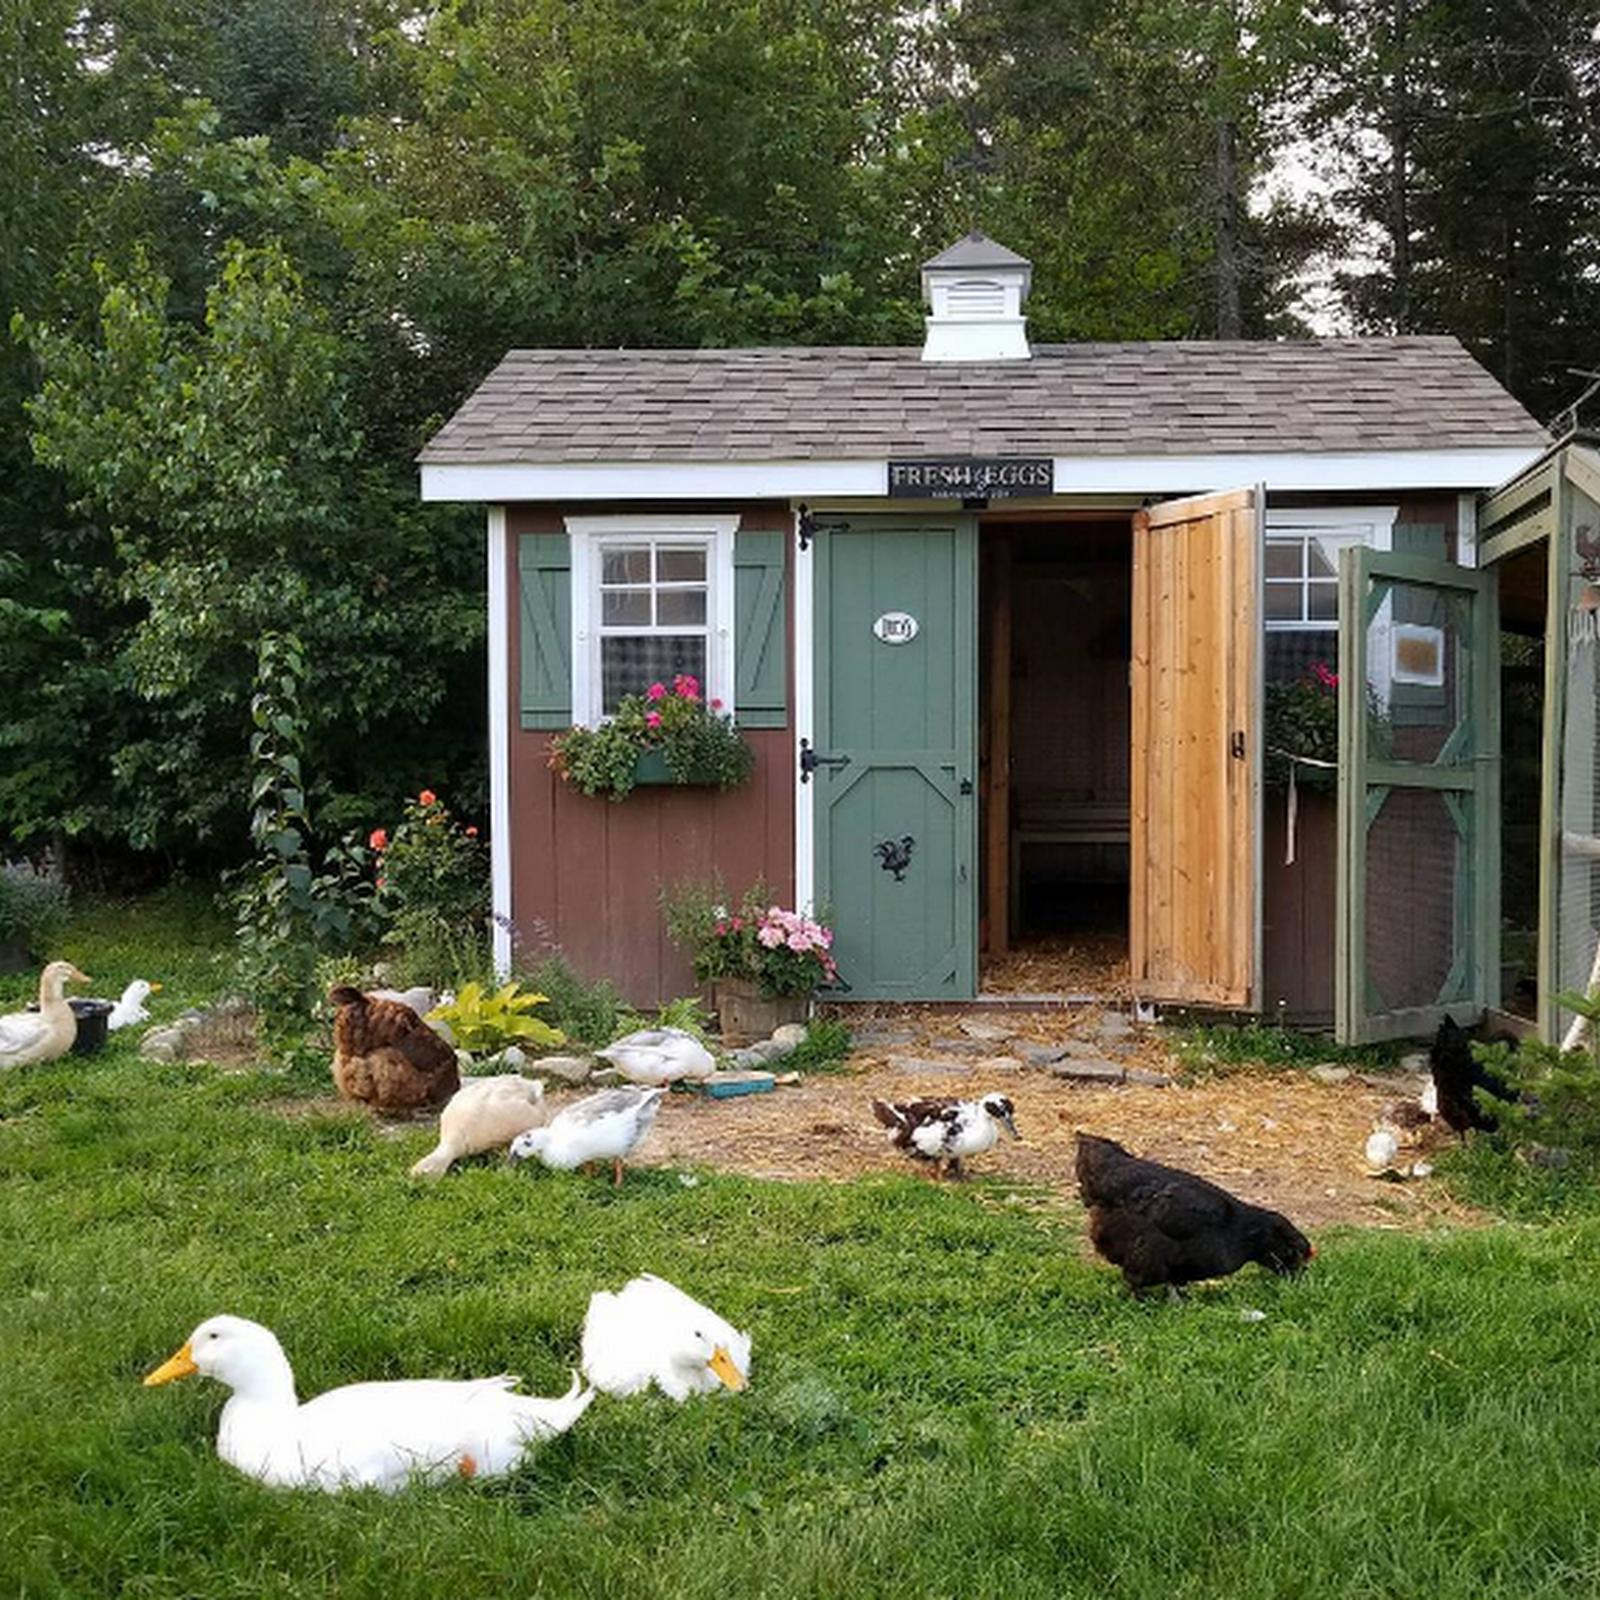 backyard chickenkeeping blog by top selling author lisa steele